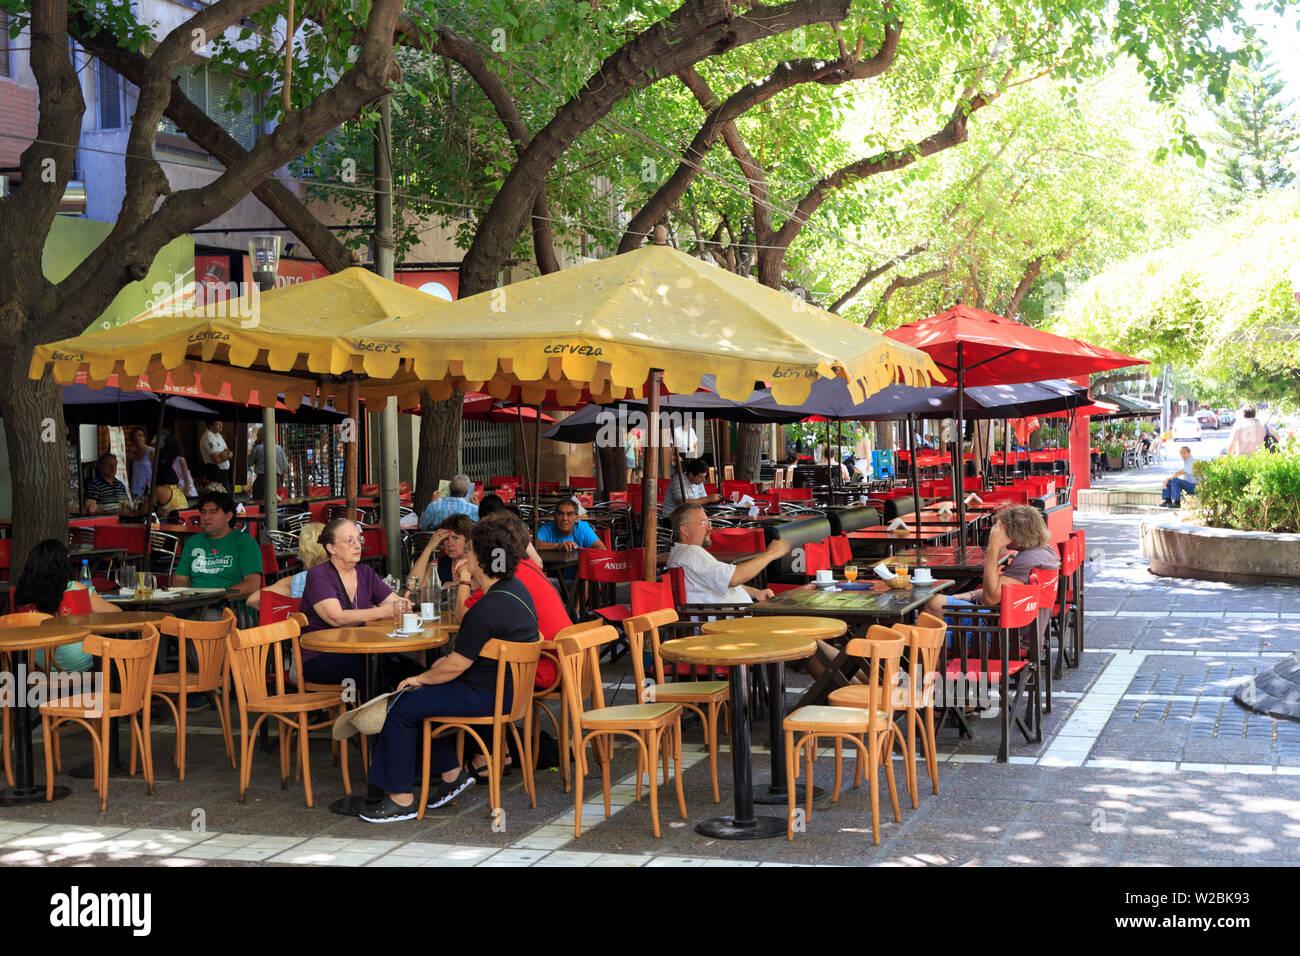 Argentina, Mendoza, Outdoor Cafes on the pedestrian Calle Sarmiento - Stock Image